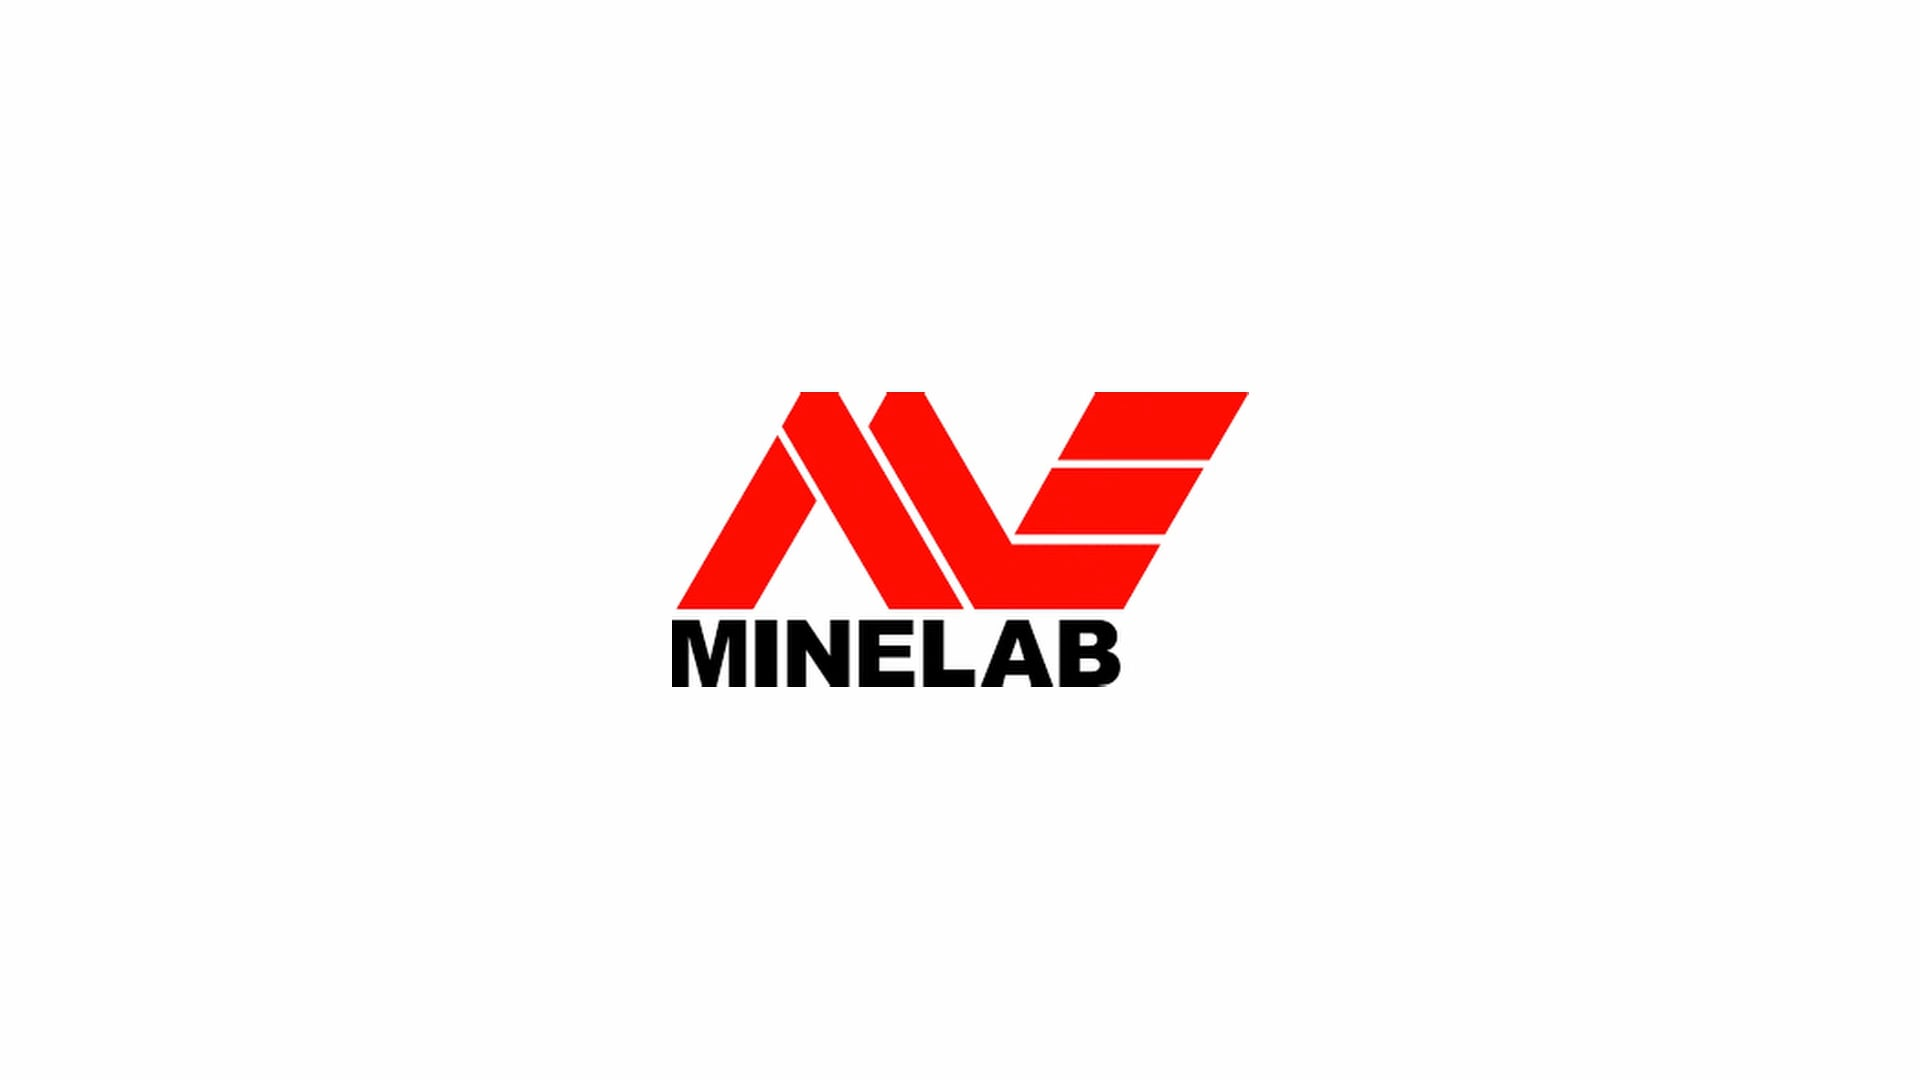 Minelab Vanquish - The launch